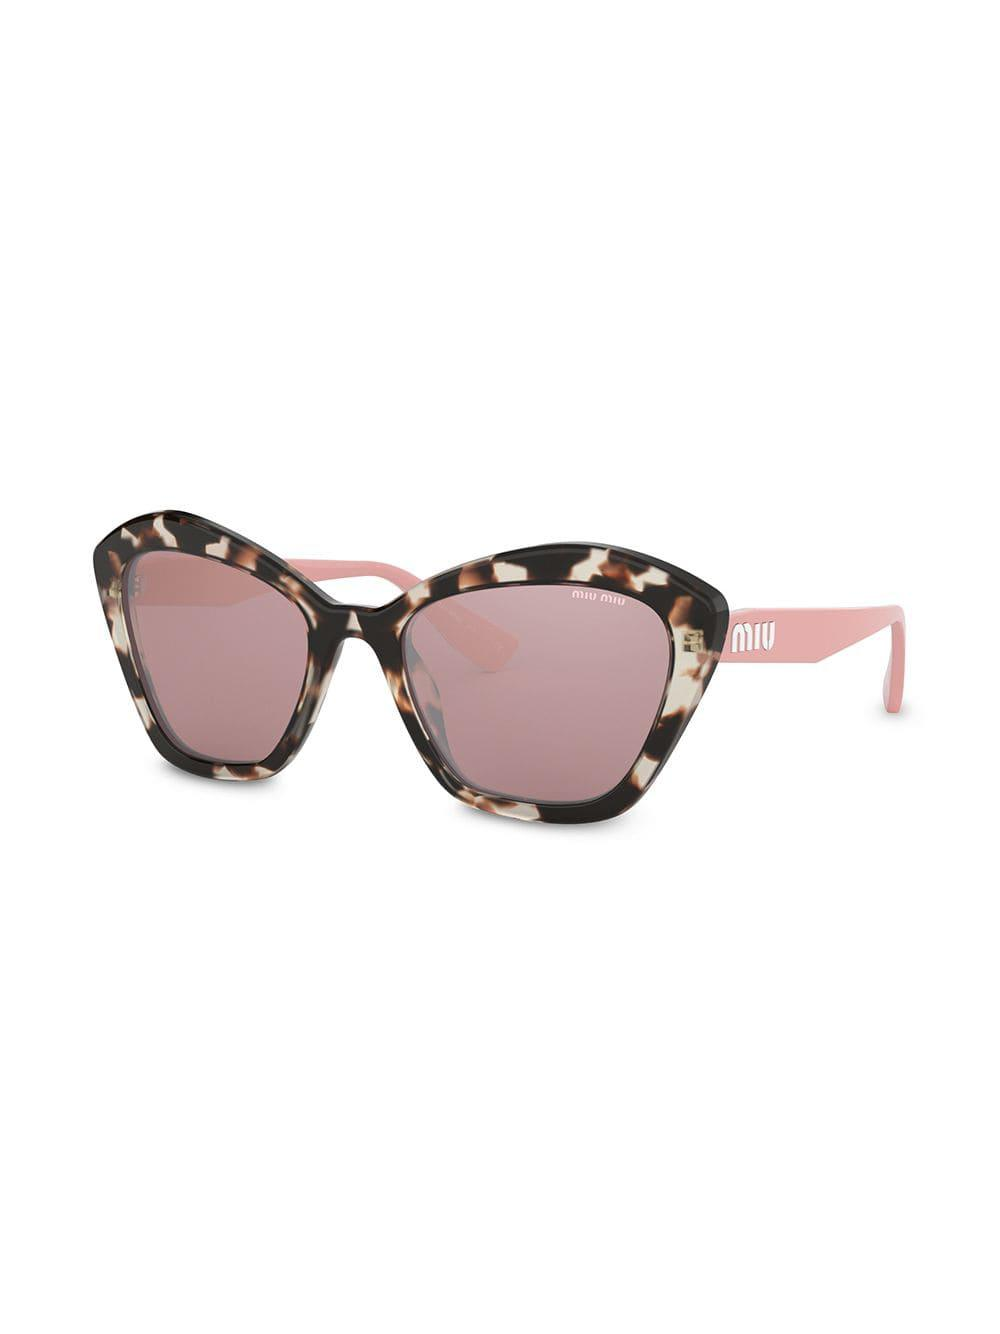 e518baa766f Miu Miu Oversized Cat-eye Sunglasses in Brown - Lyst